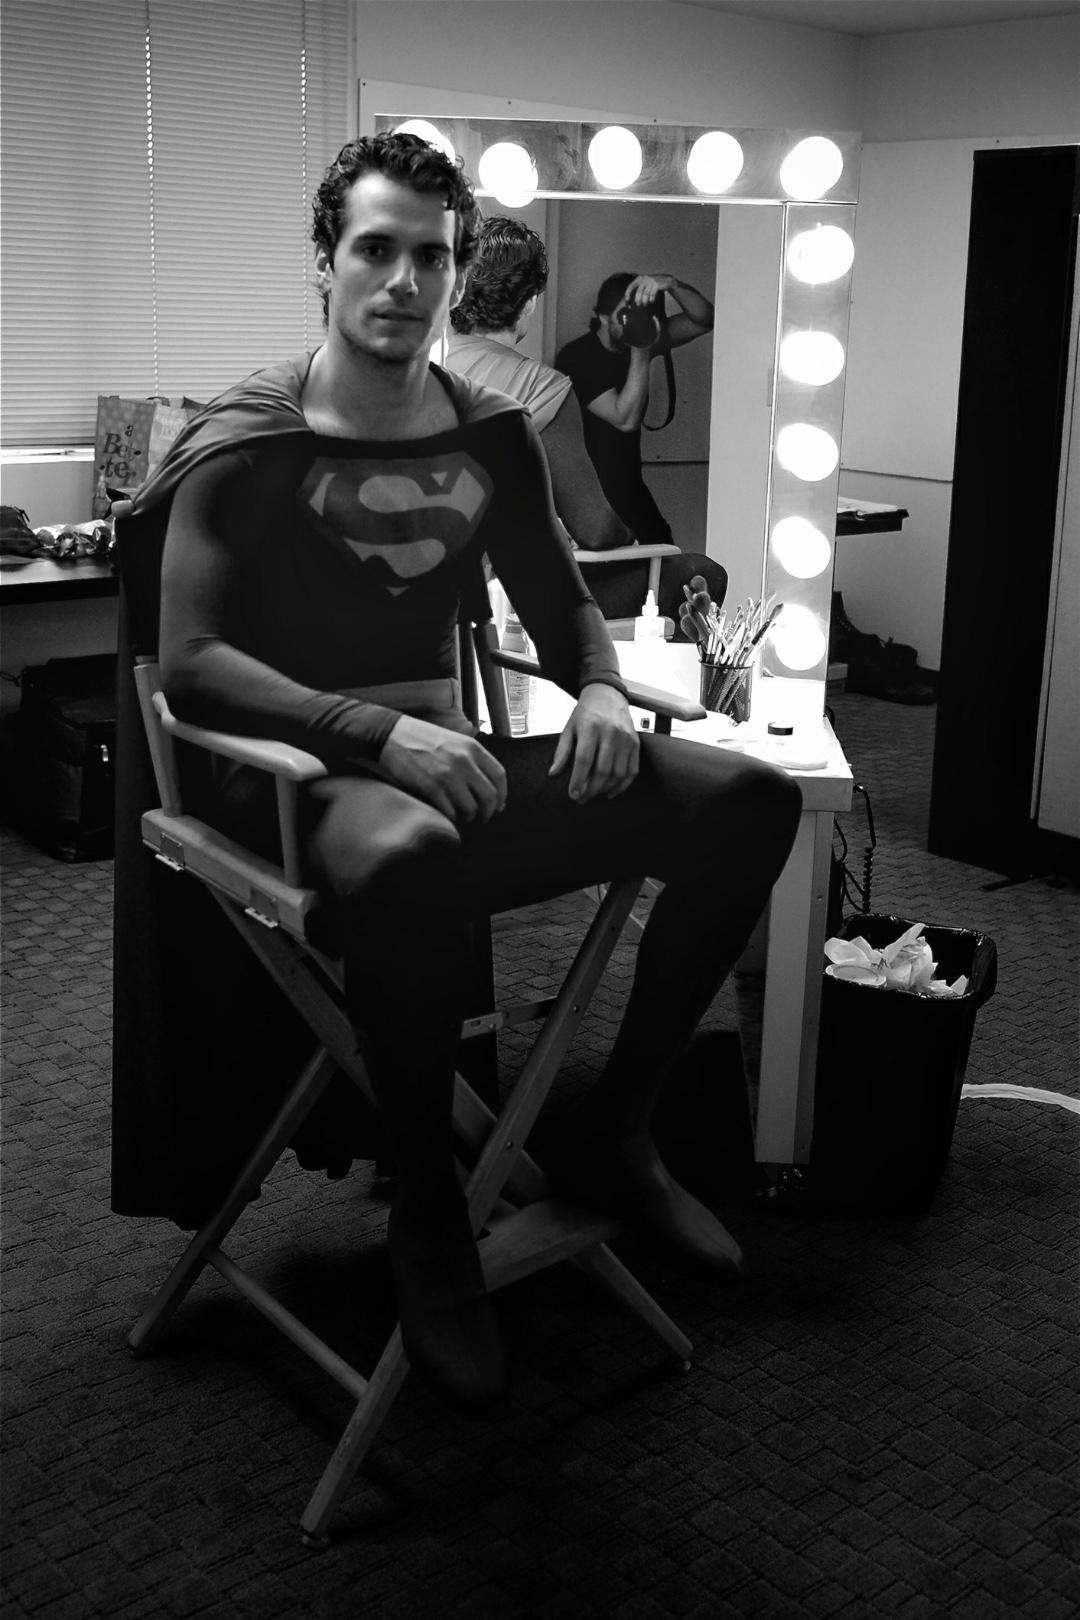 Cavill Reeve Superman Costume